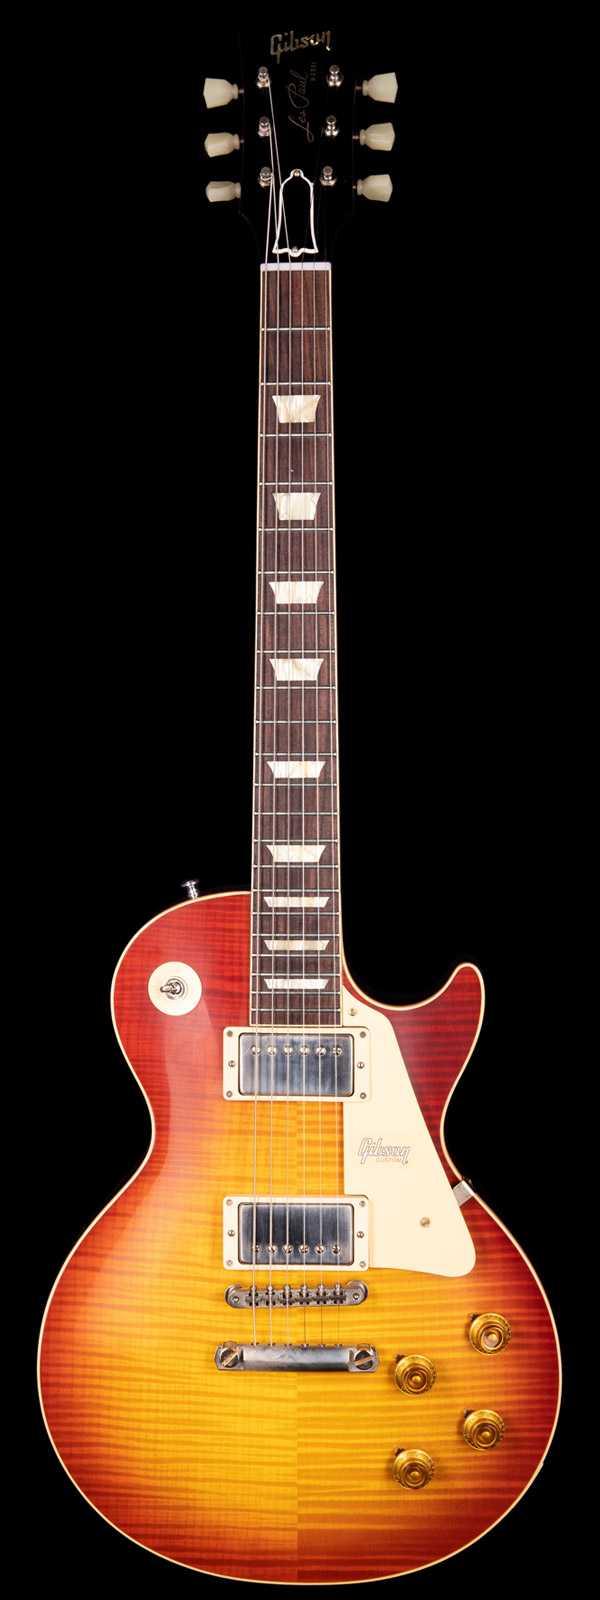 Gibson Custom Shop 60th Anniversary 1959 Les Paul Standard VOS Cherry Teaburst